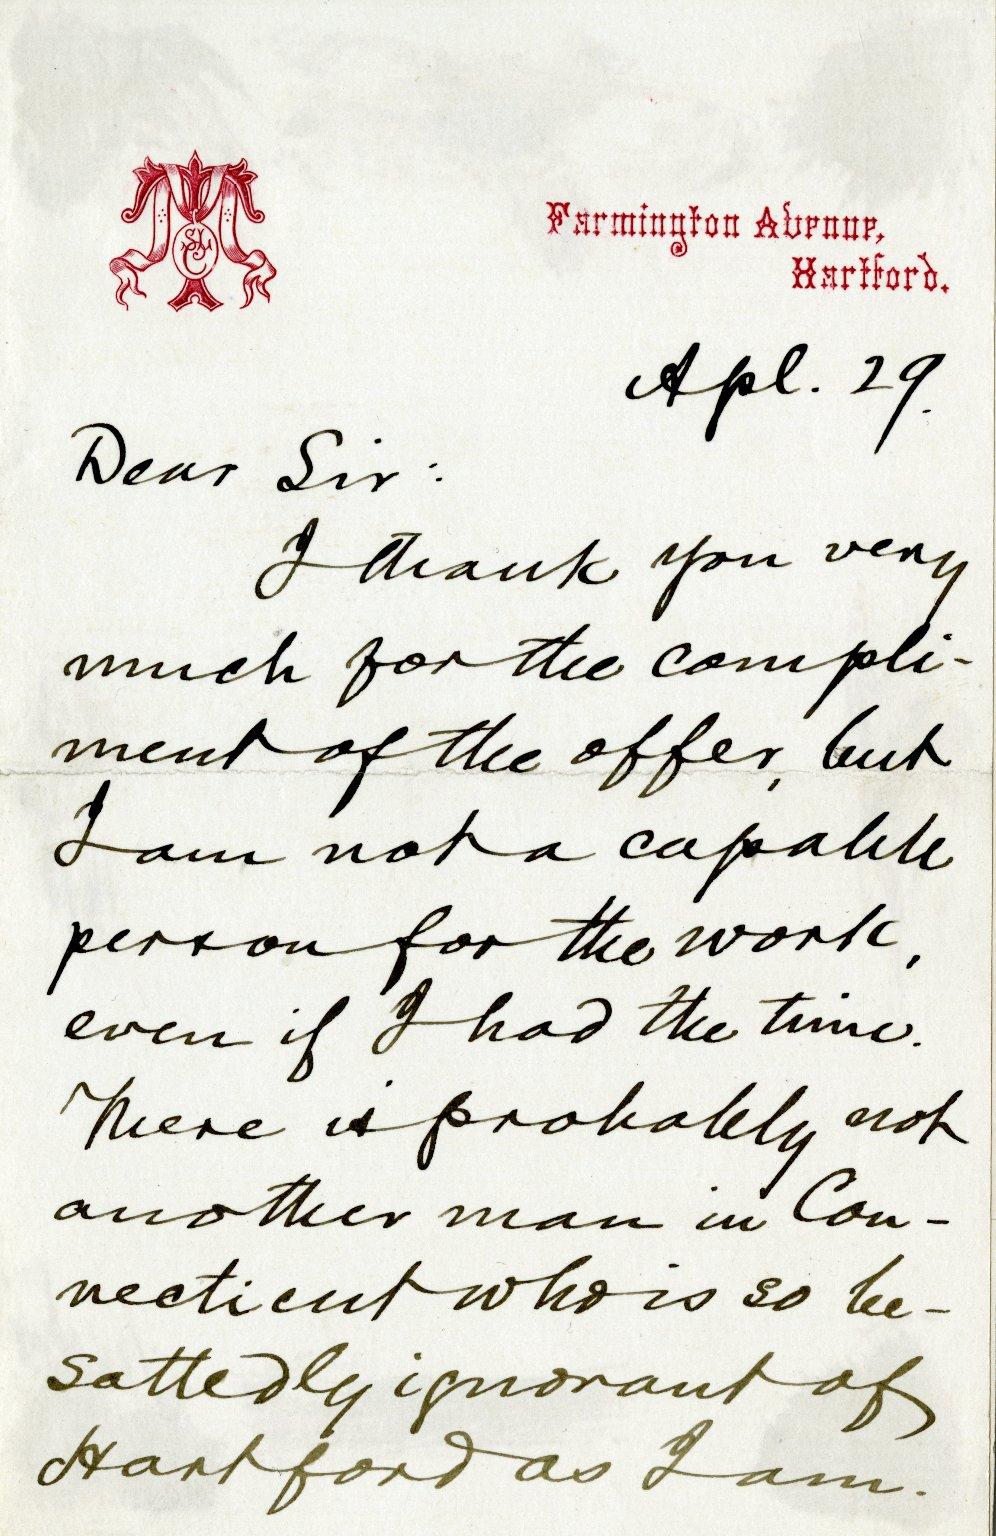 Clemens, Samuel Langhorne ALS, 2 pages, April 29, [1875].